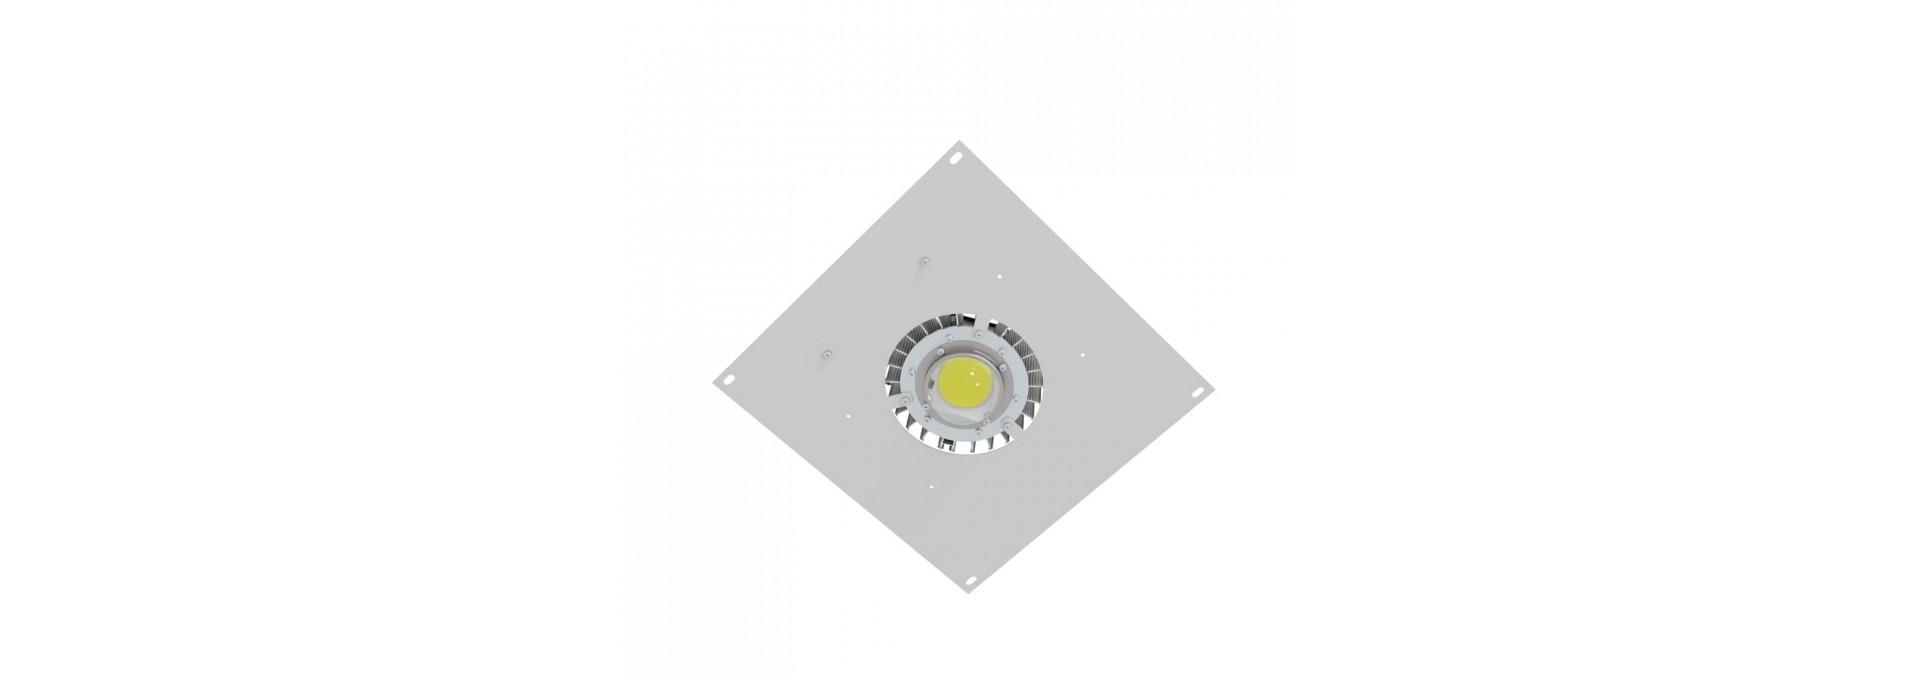 АЗС 50 Экстра 4500К 120°